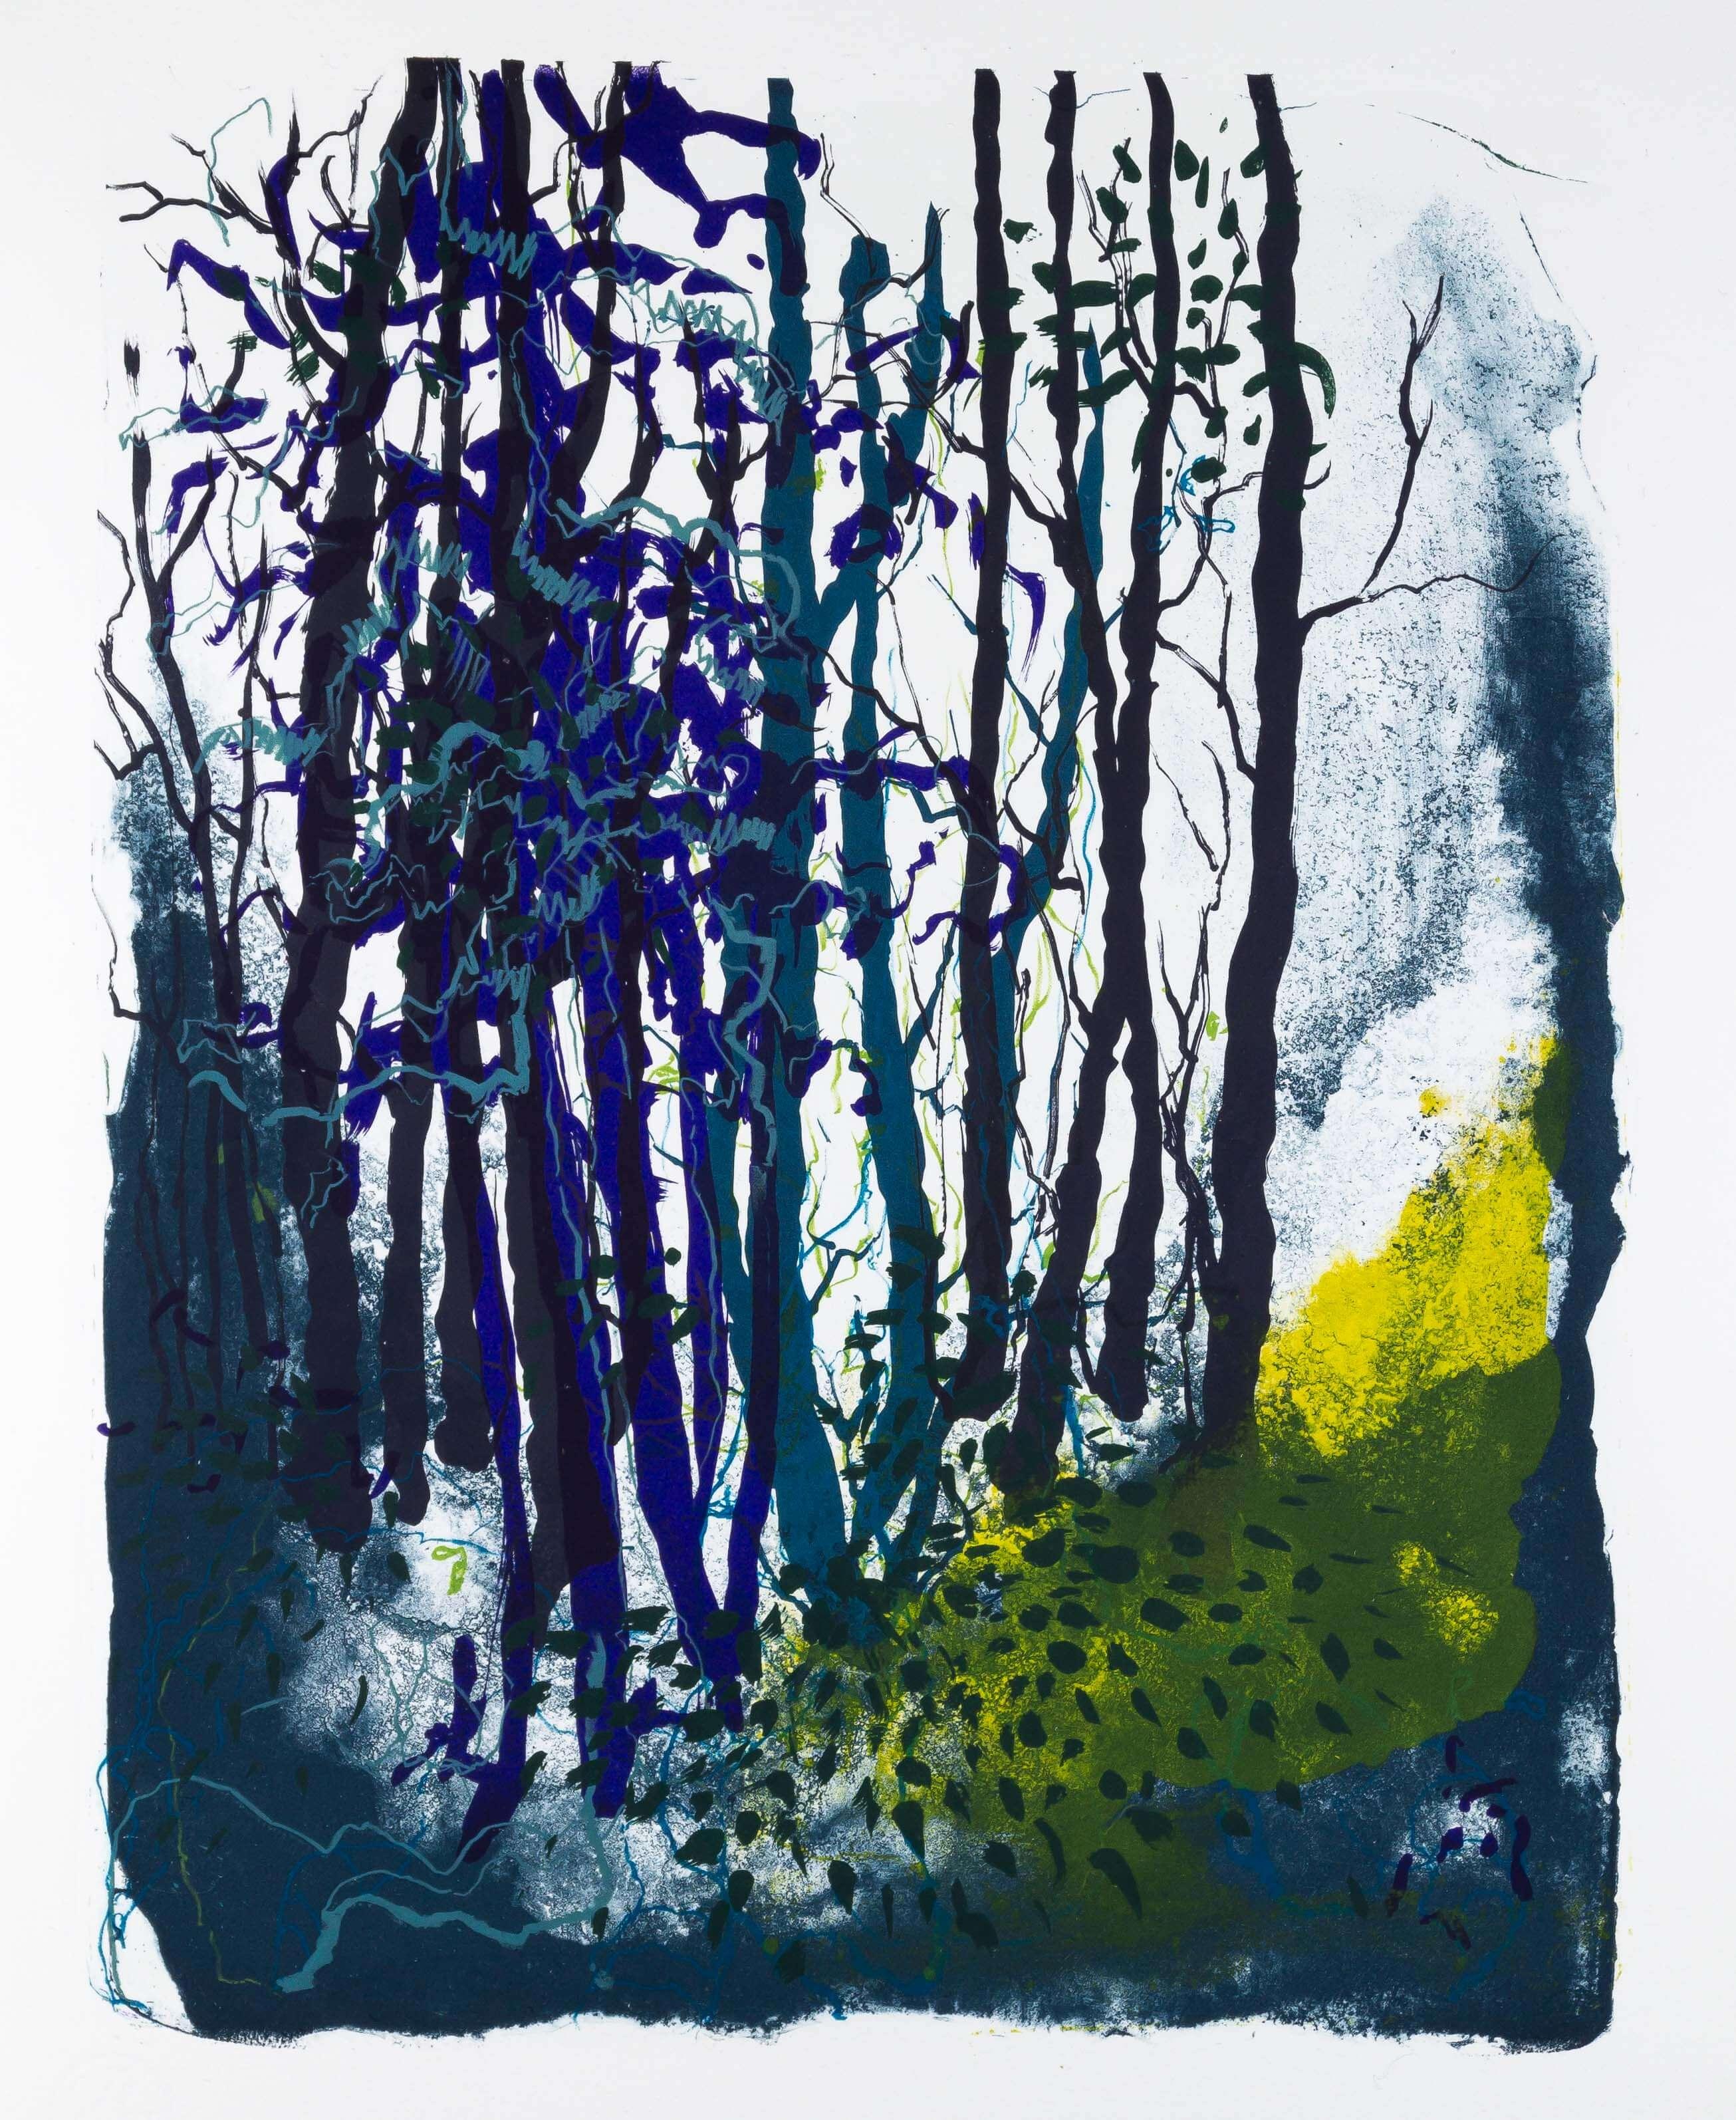 Katharina Albers: Wald X(F)-VI, 2017, Farb-Lithographie, Unikat, 50x40 cm